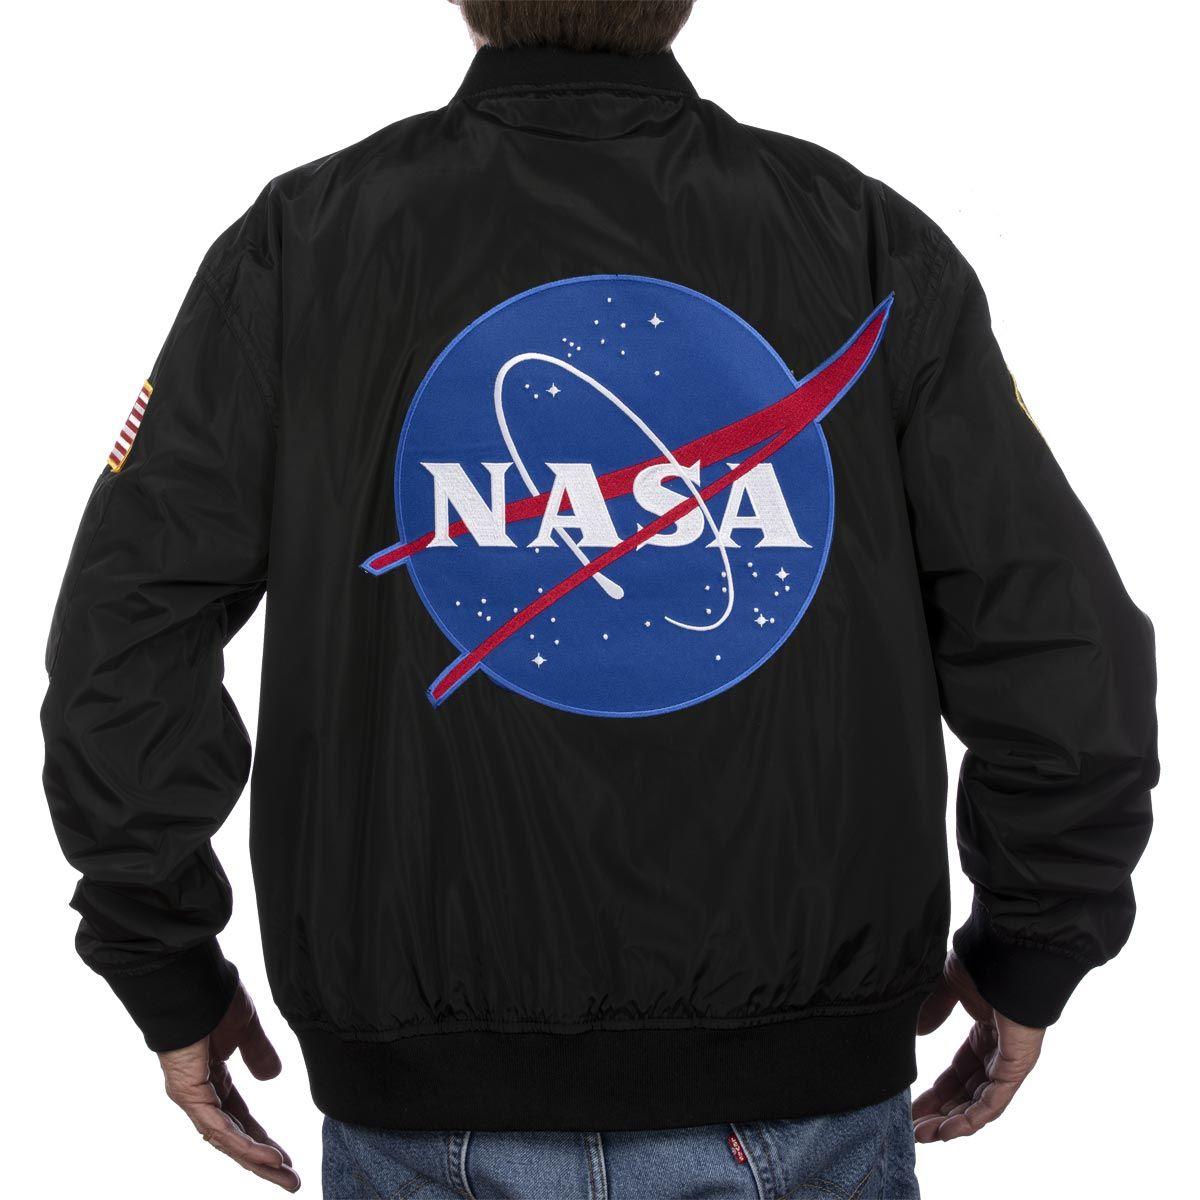 NASA Meatball Patch Bomber Flight Jacket - Intro Sale $99 ...